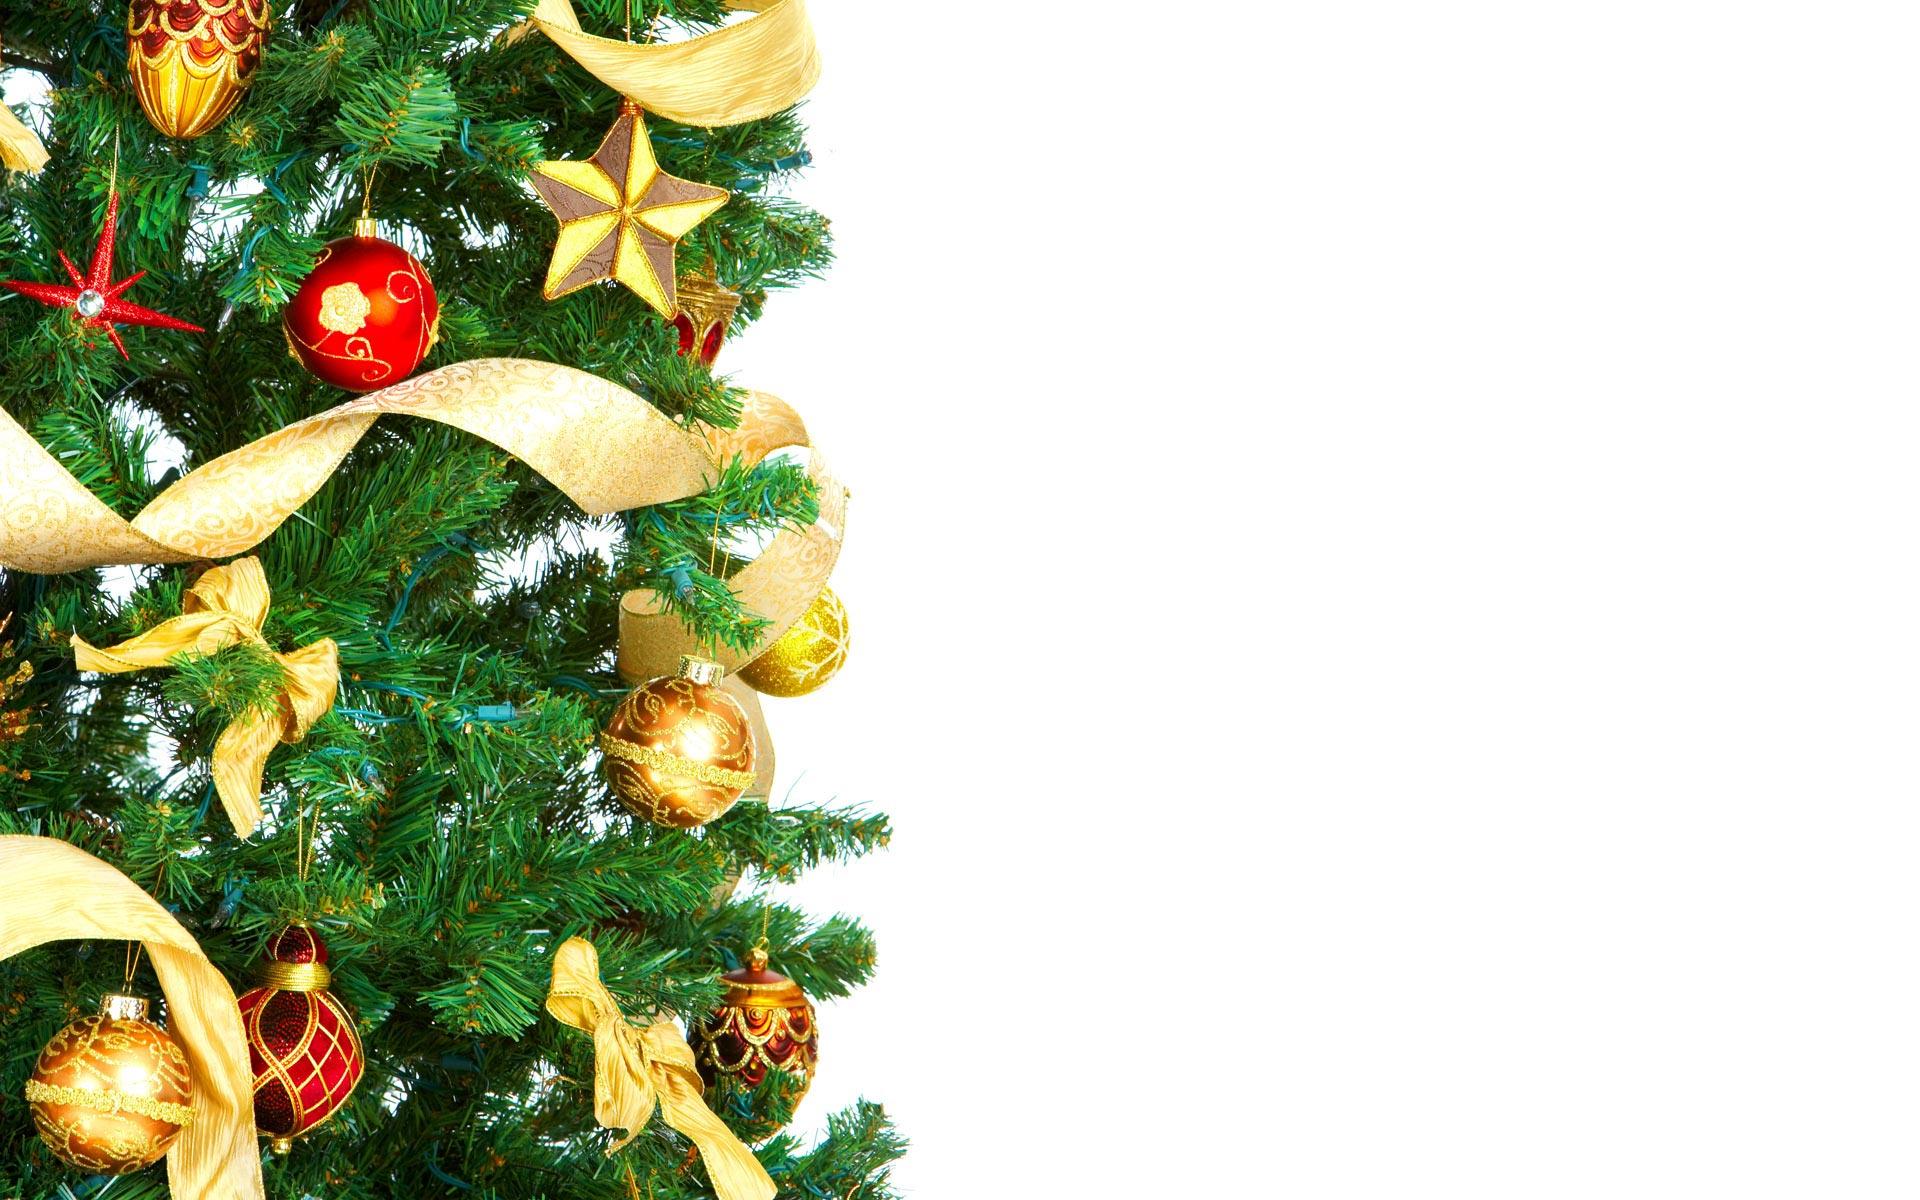 Sfondi Natalizi Originali.Sfondo Desktop Albero Di Natale Sfondo Natalizio Albero Di